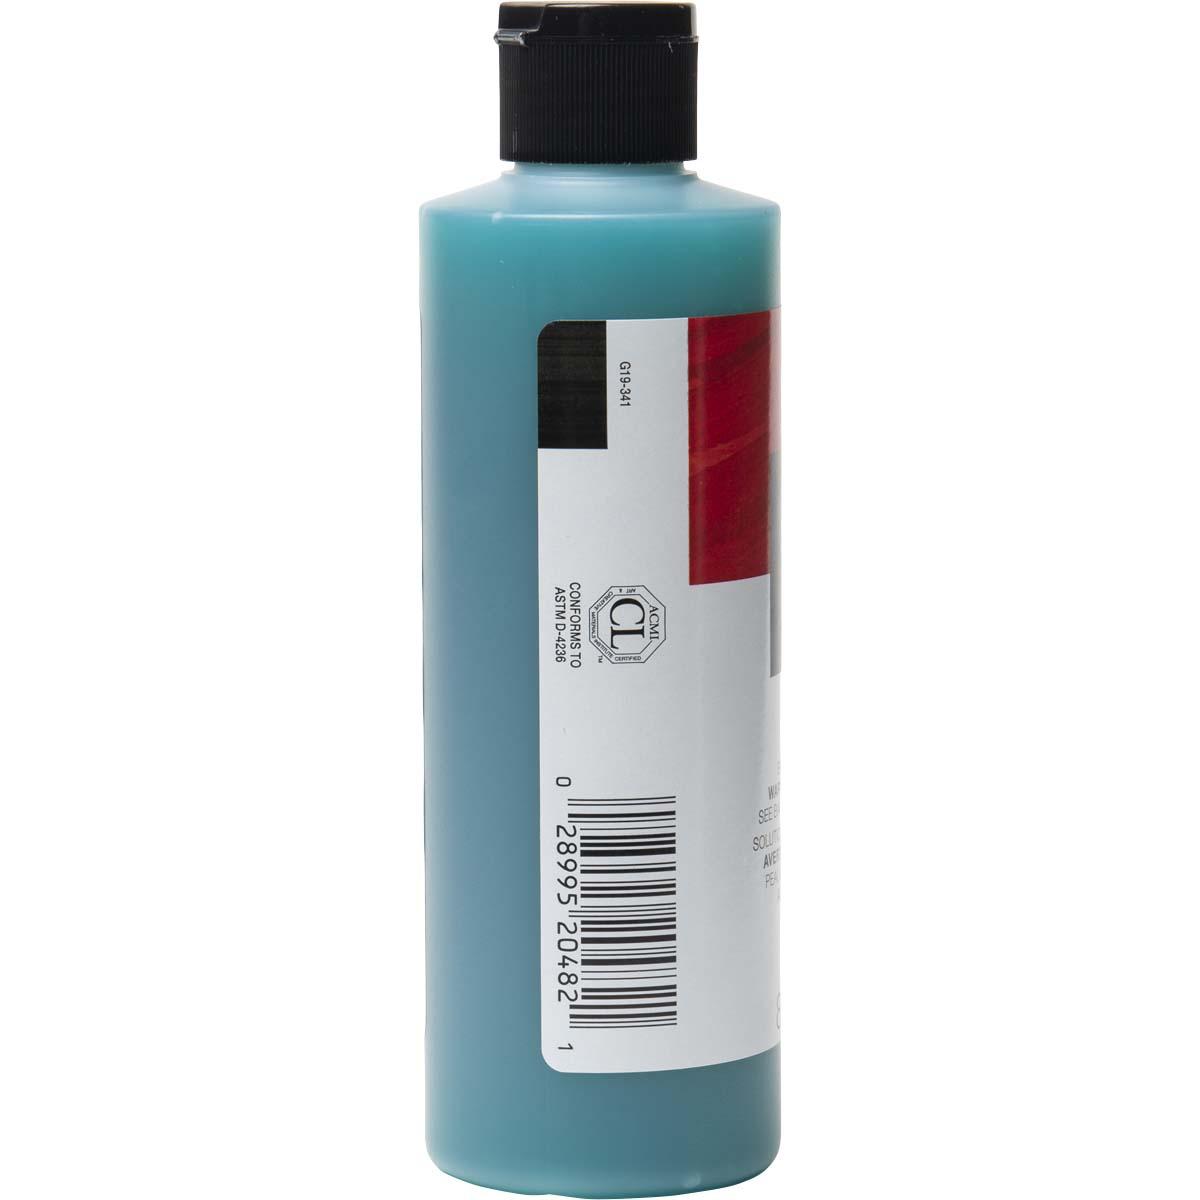 FolkArt ® Brush Plus™, 8 oz. - 20482